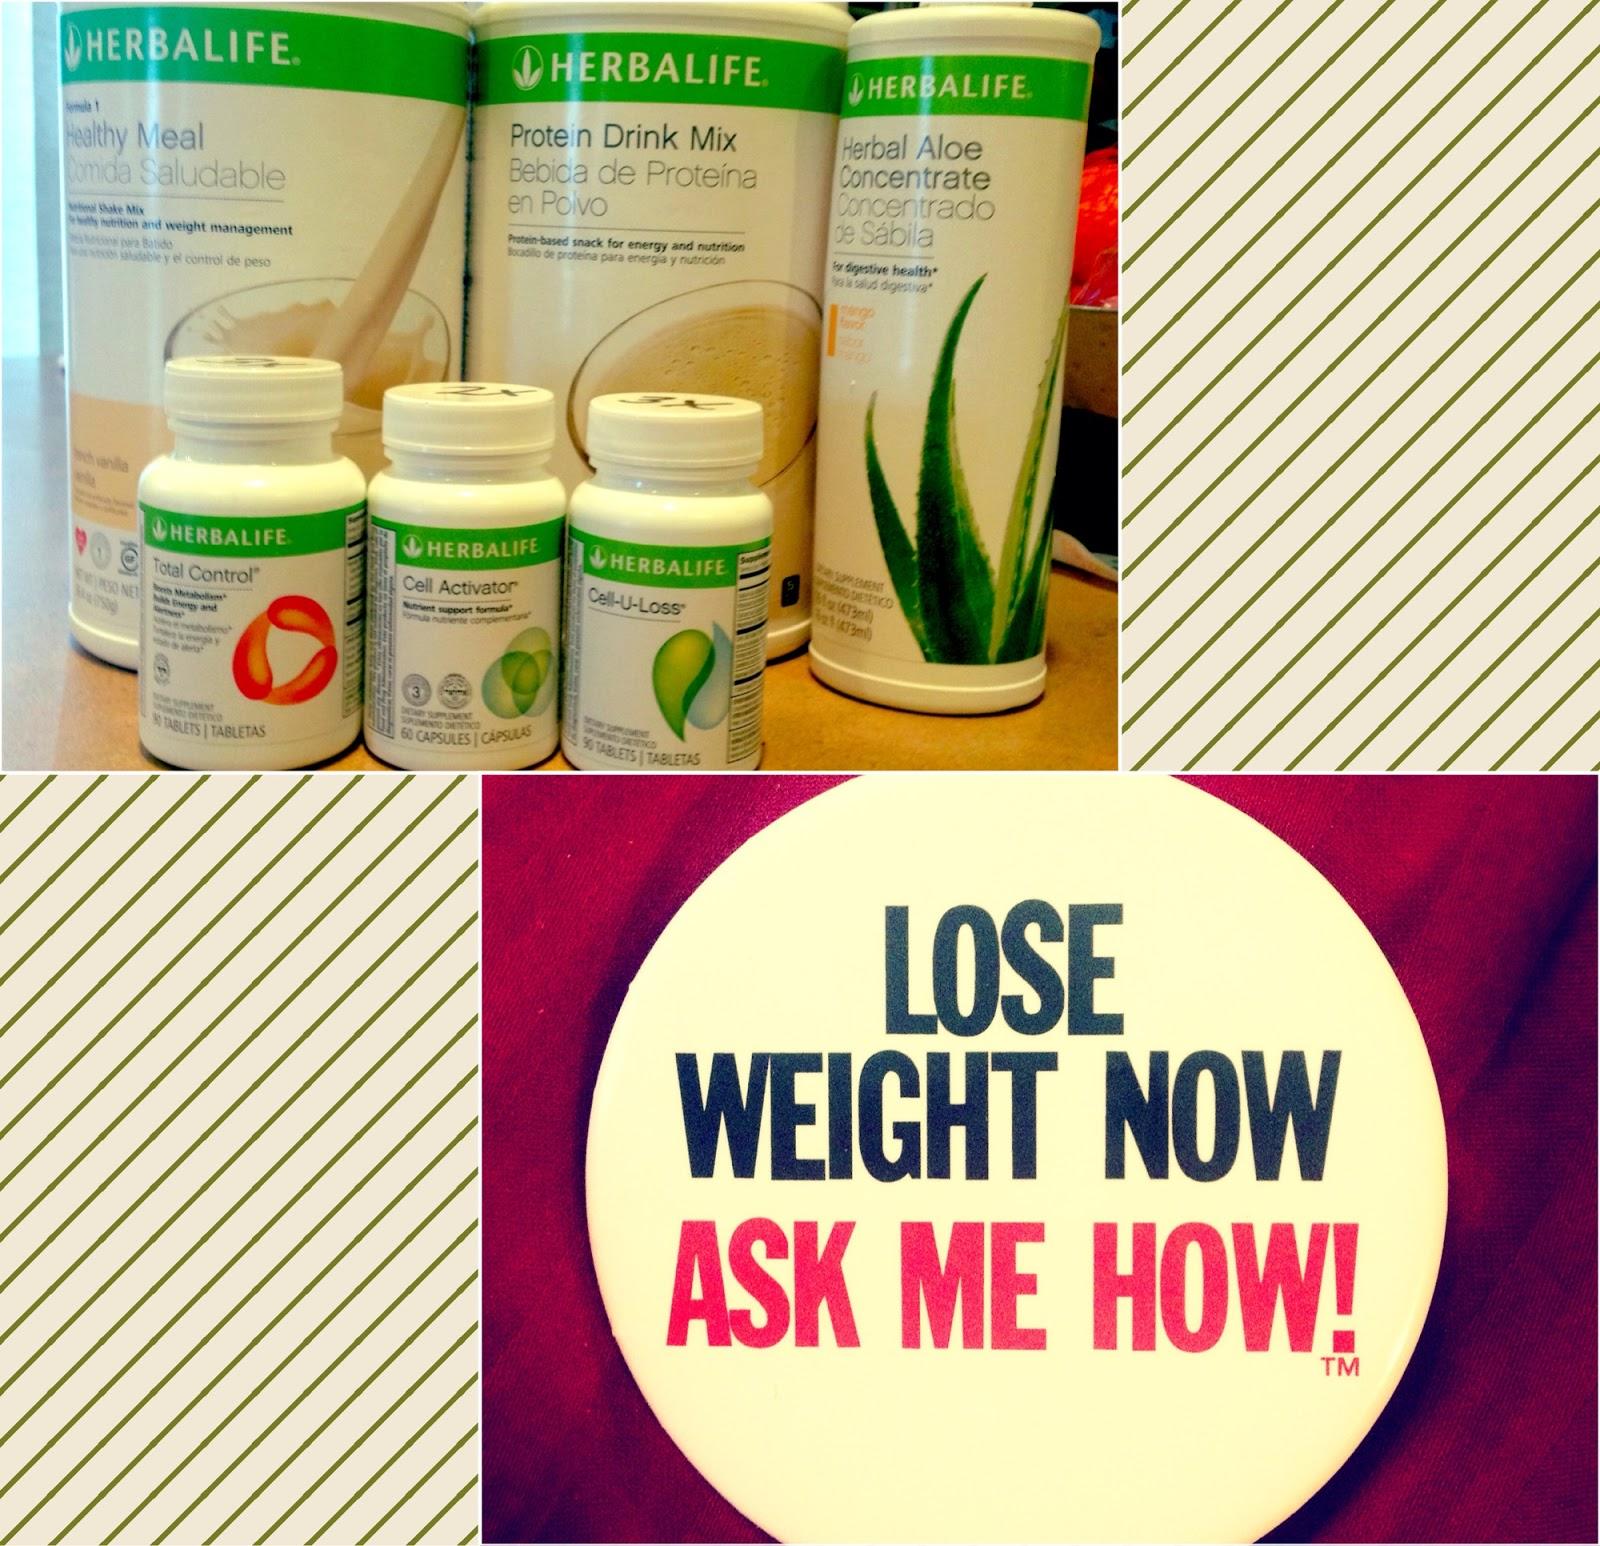 12 pounds down in 3 weeks: MY SECRET!